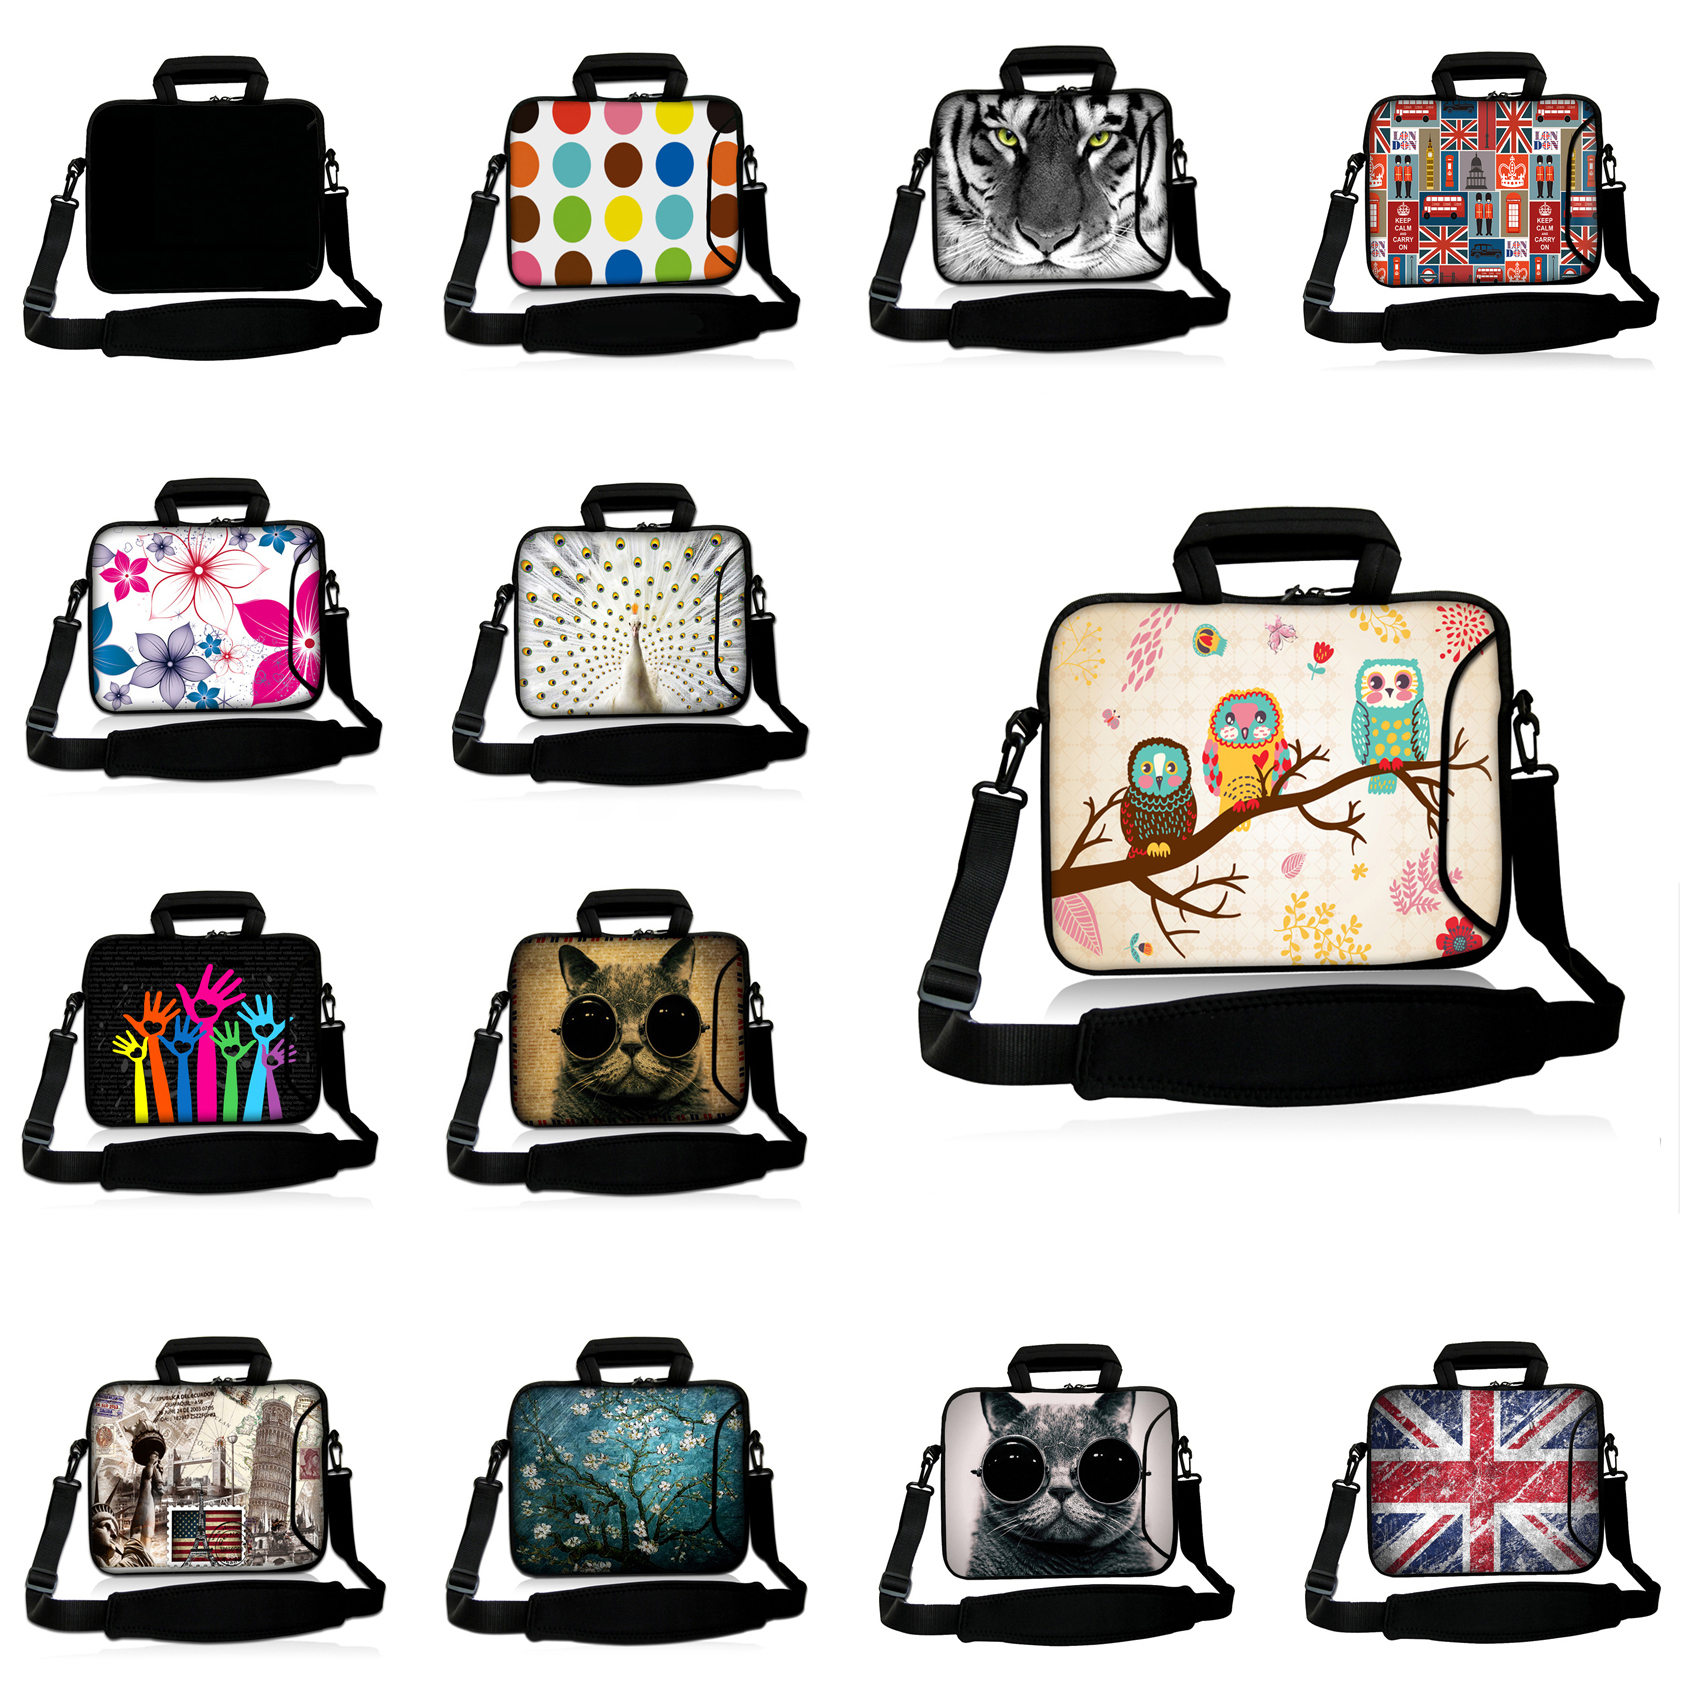 12 Inch Nylon Shoulder Laptop Bag 11.6 Inch Messenger Neoprene Briefcase 12.2 Tablets Waterproof Handbag For Macbook Chuwi Hi12